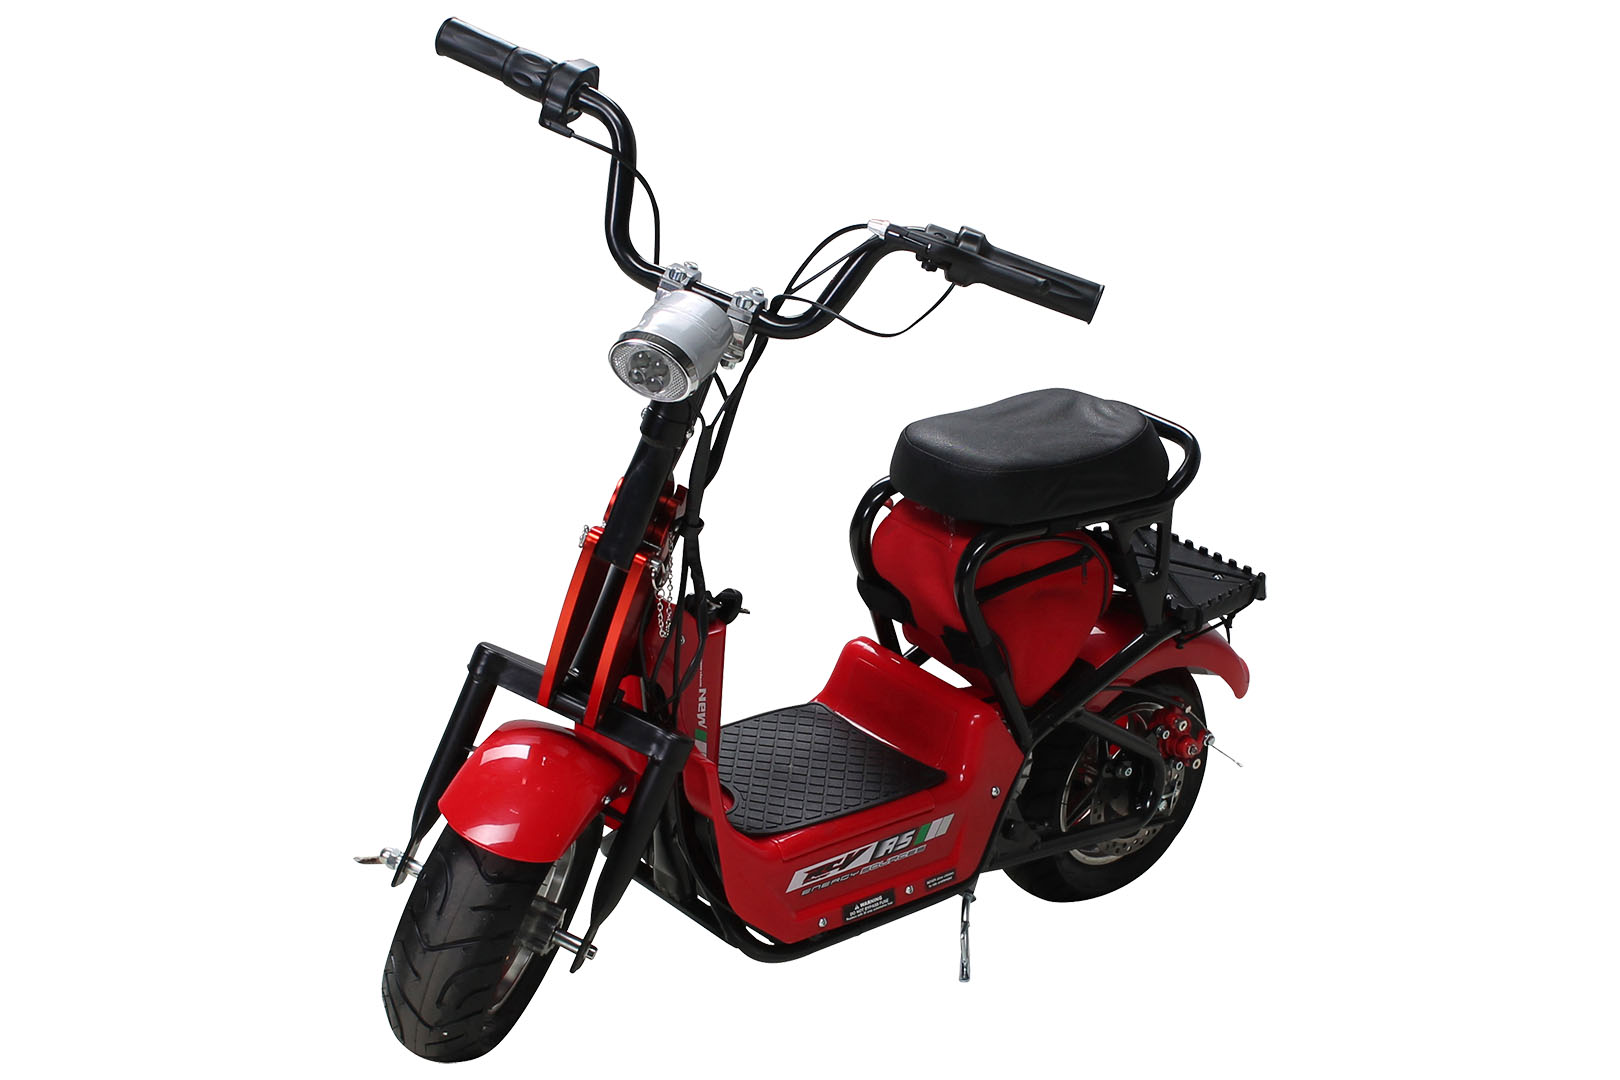 mini e bike minibike scooter sq350dh 350 watt e scooter elektroroller kinder ebay. Black Bedroom Furniture Sets. Home Design Ideas